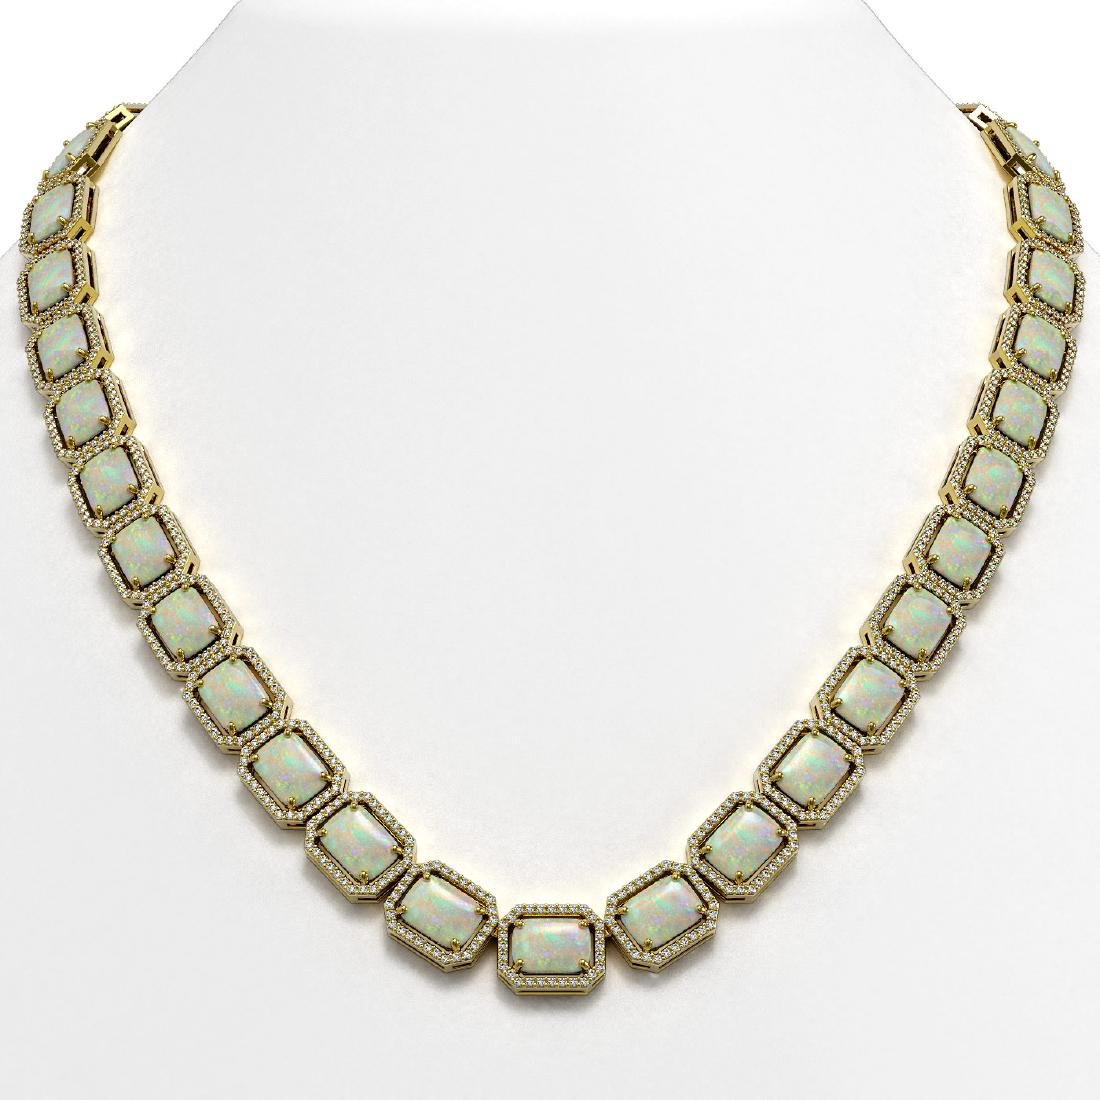 53.59 CTW Opal & Diamond Halo Necklace 10K Yellow Gold